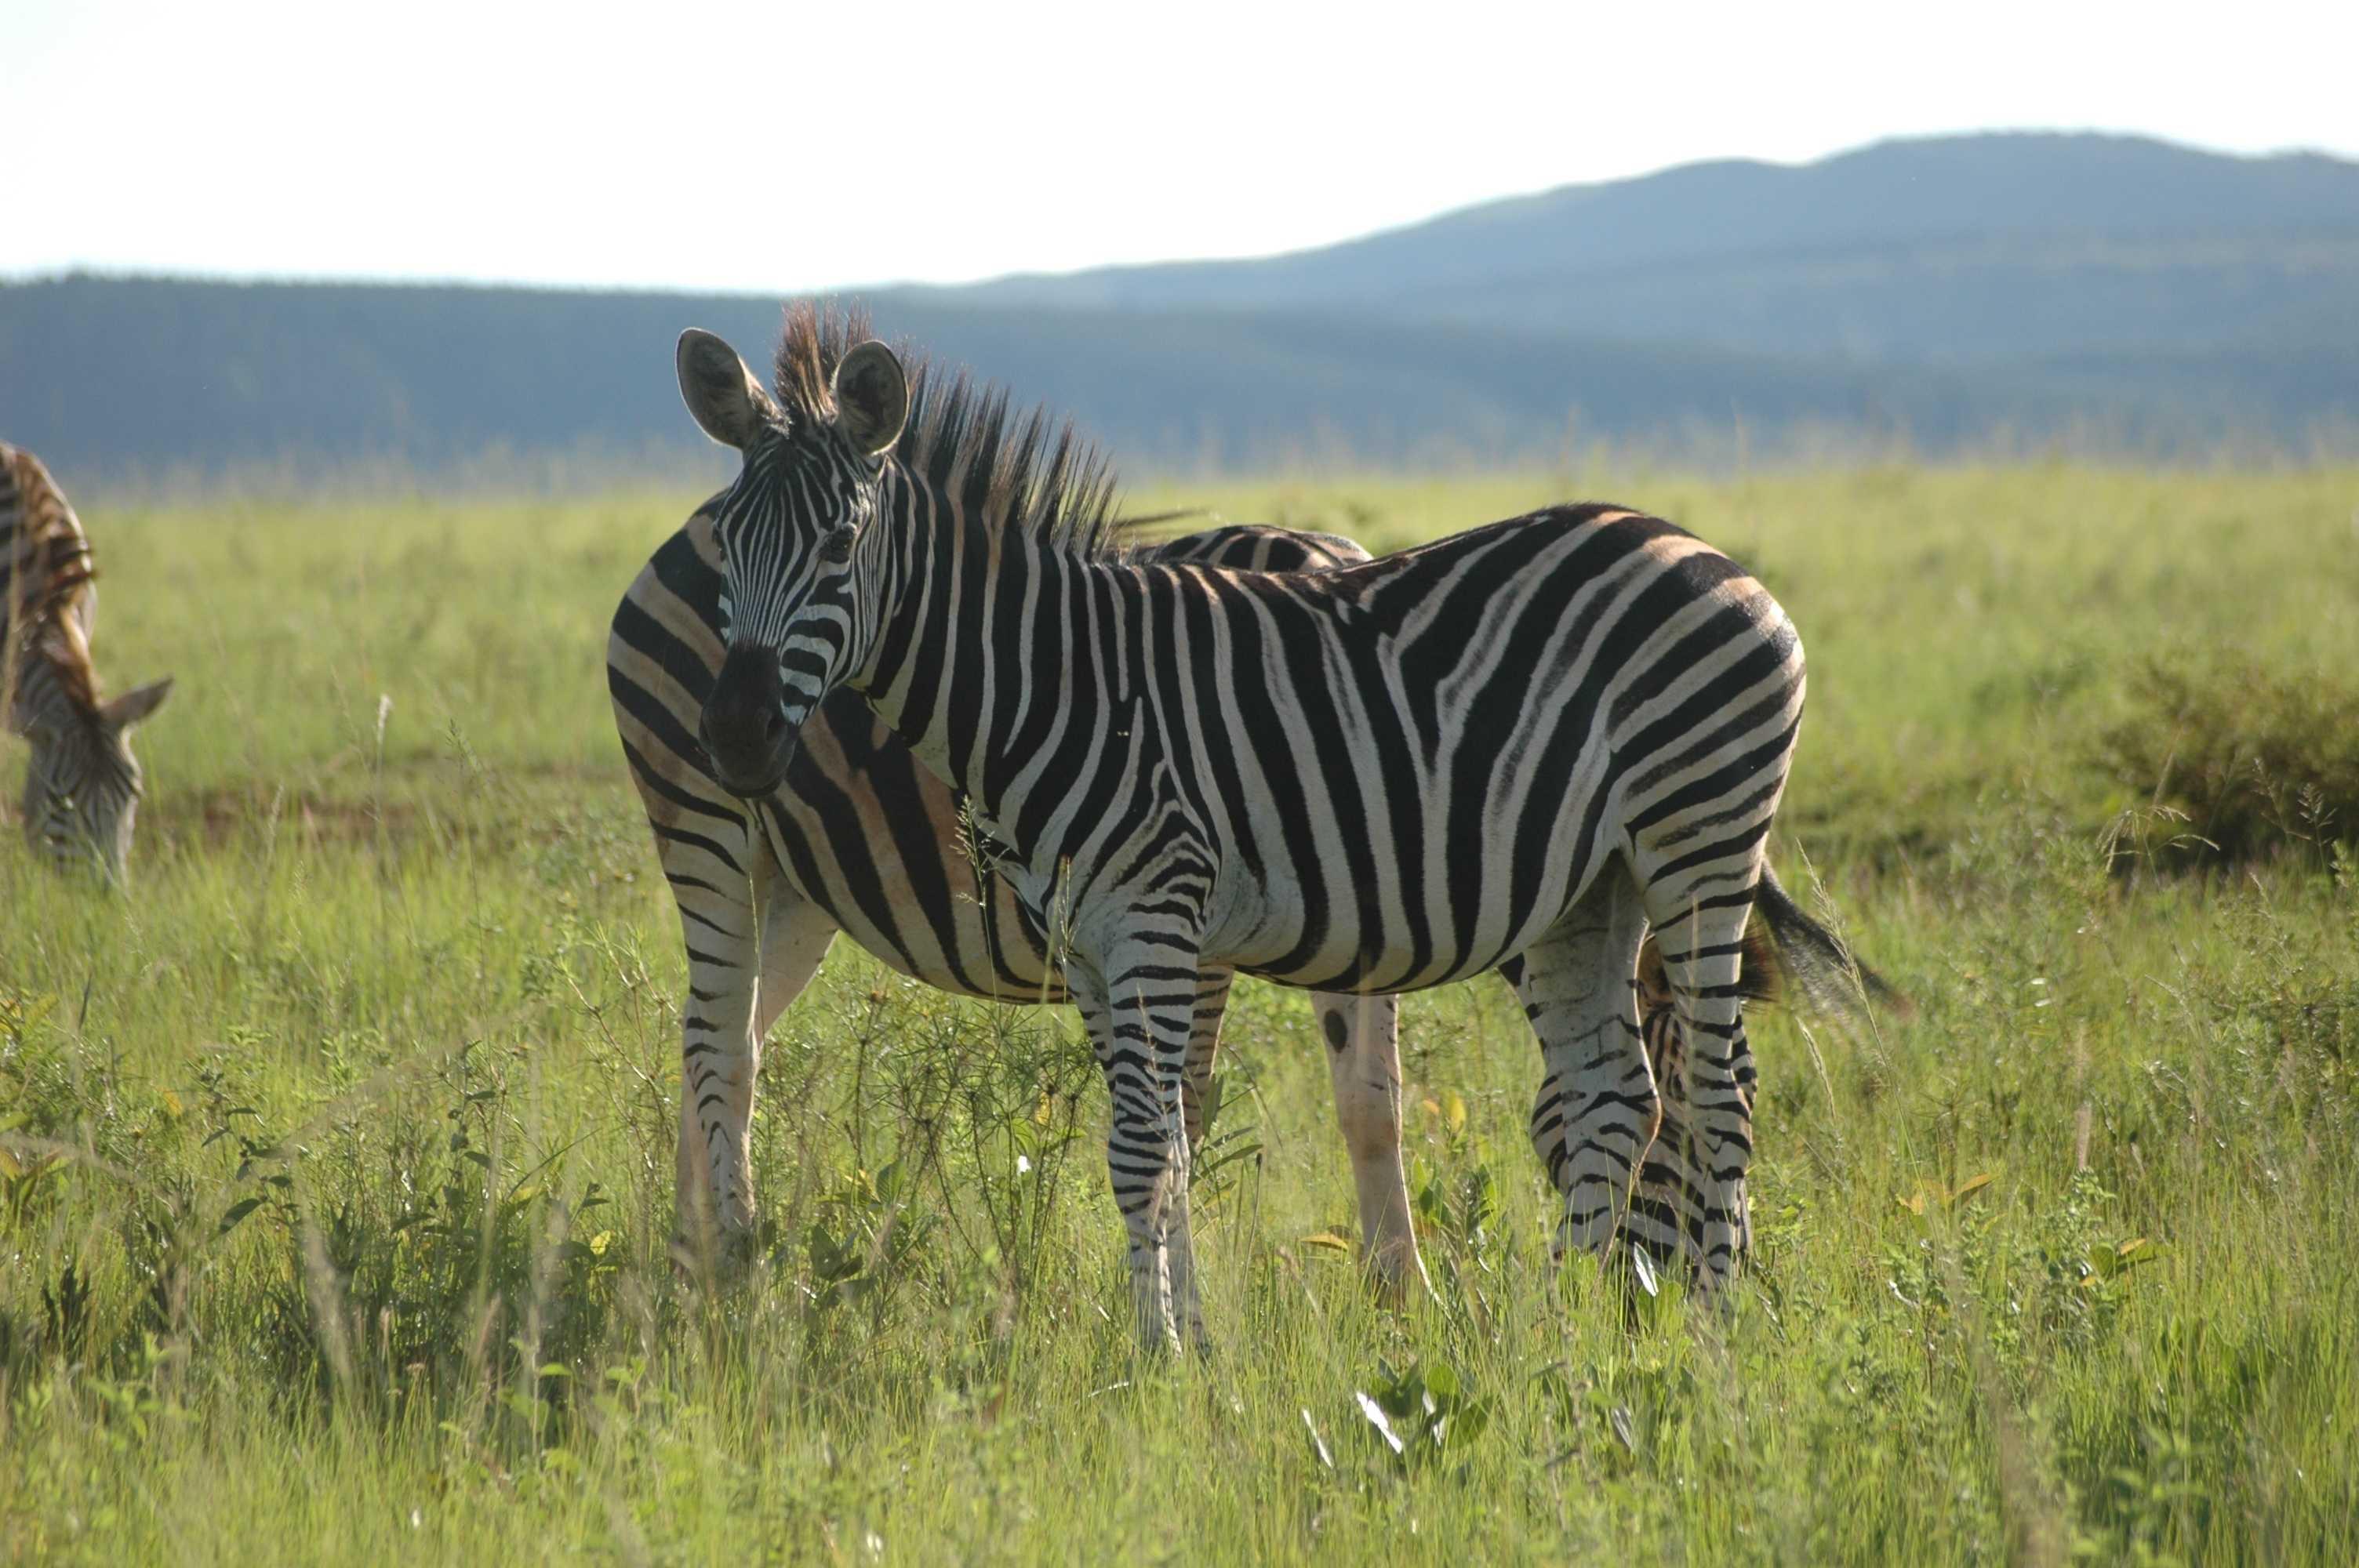 zebra wildlife south africa - HD1280×851